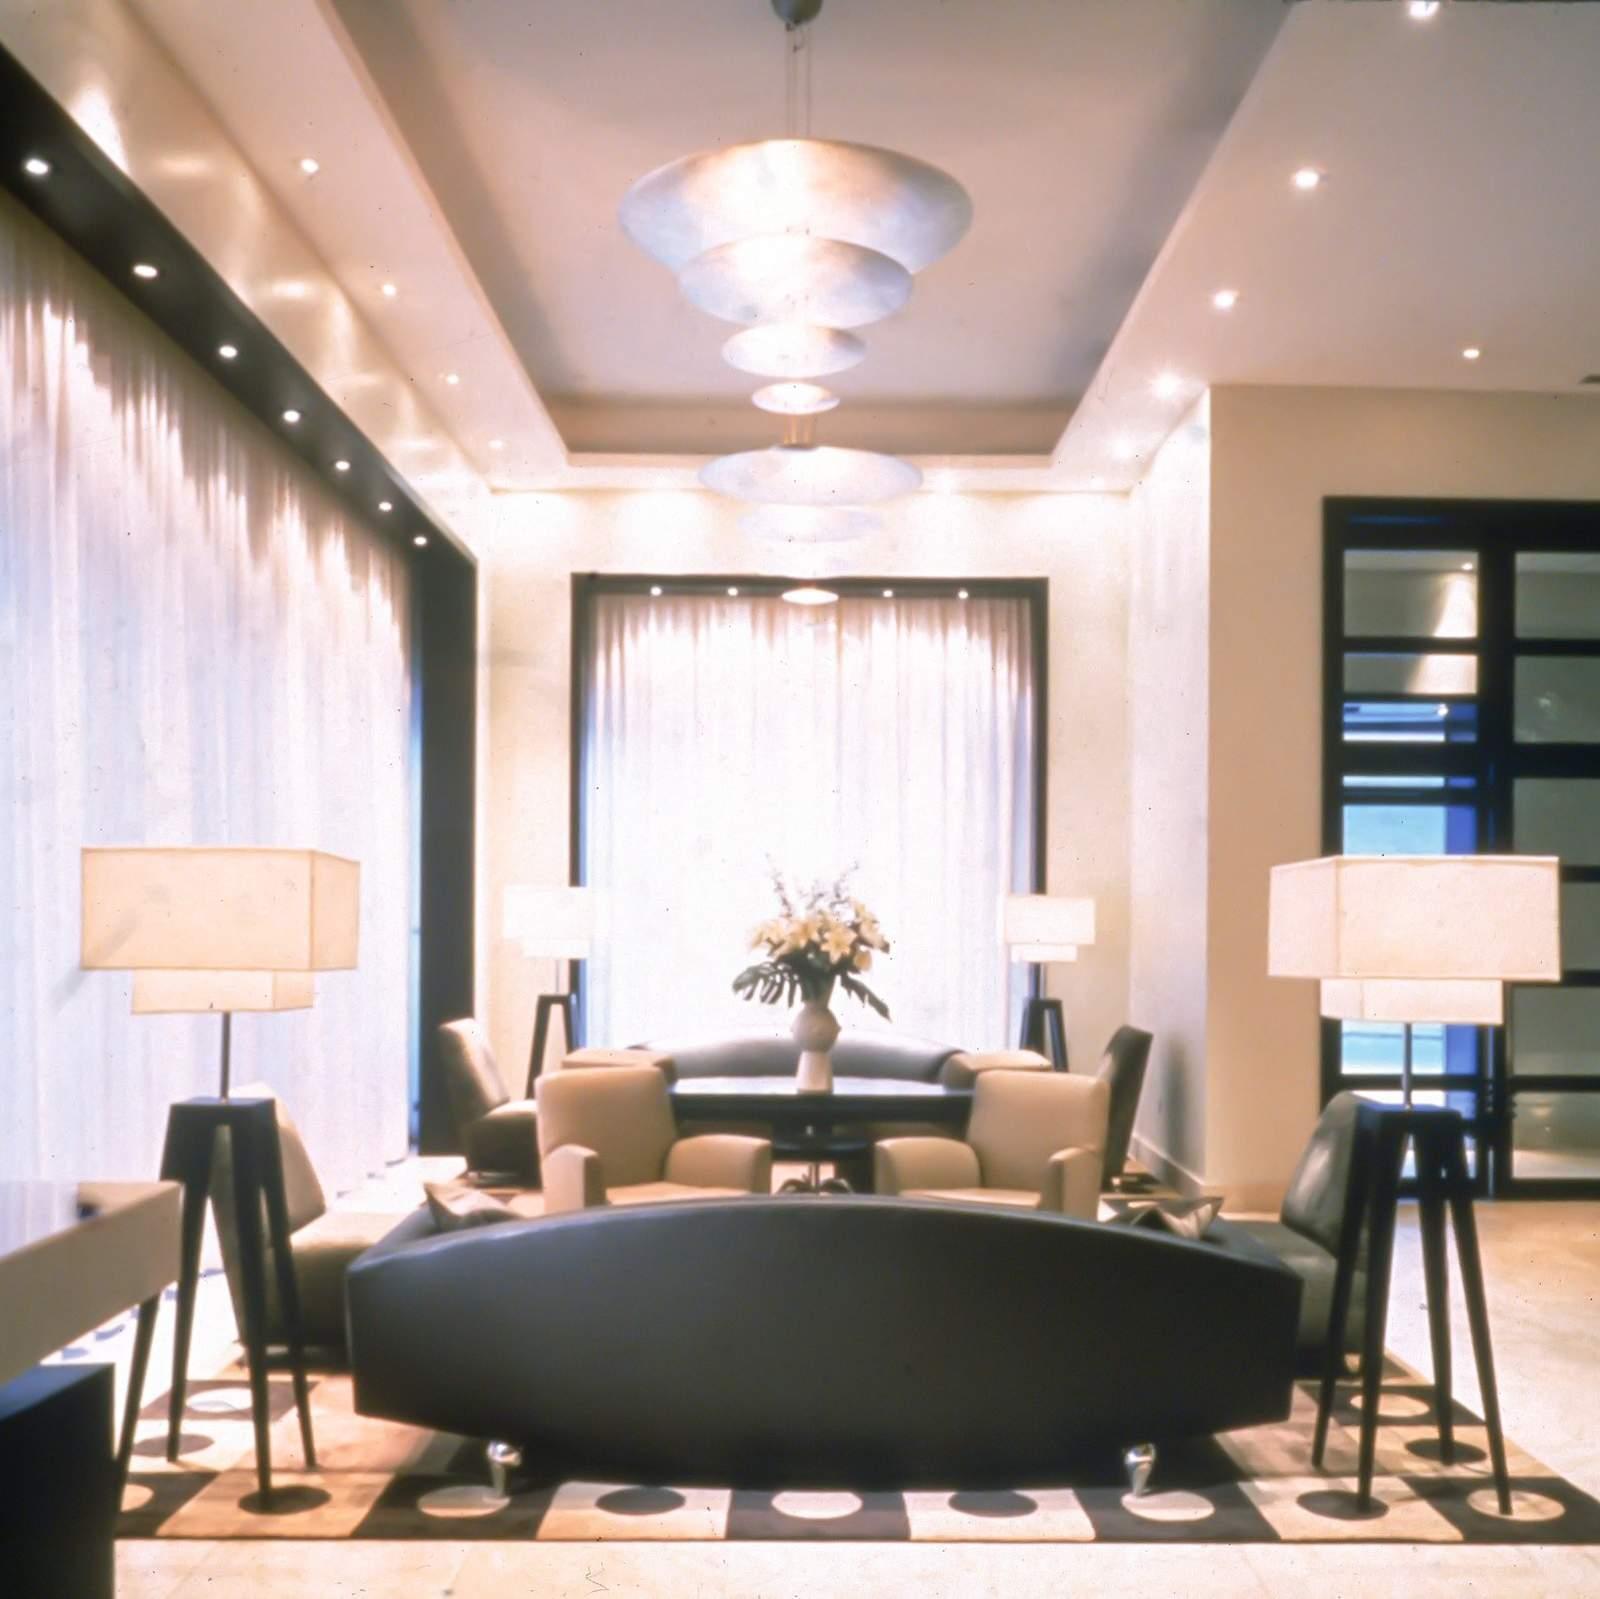 Hotel, New York: Bentley Hotel